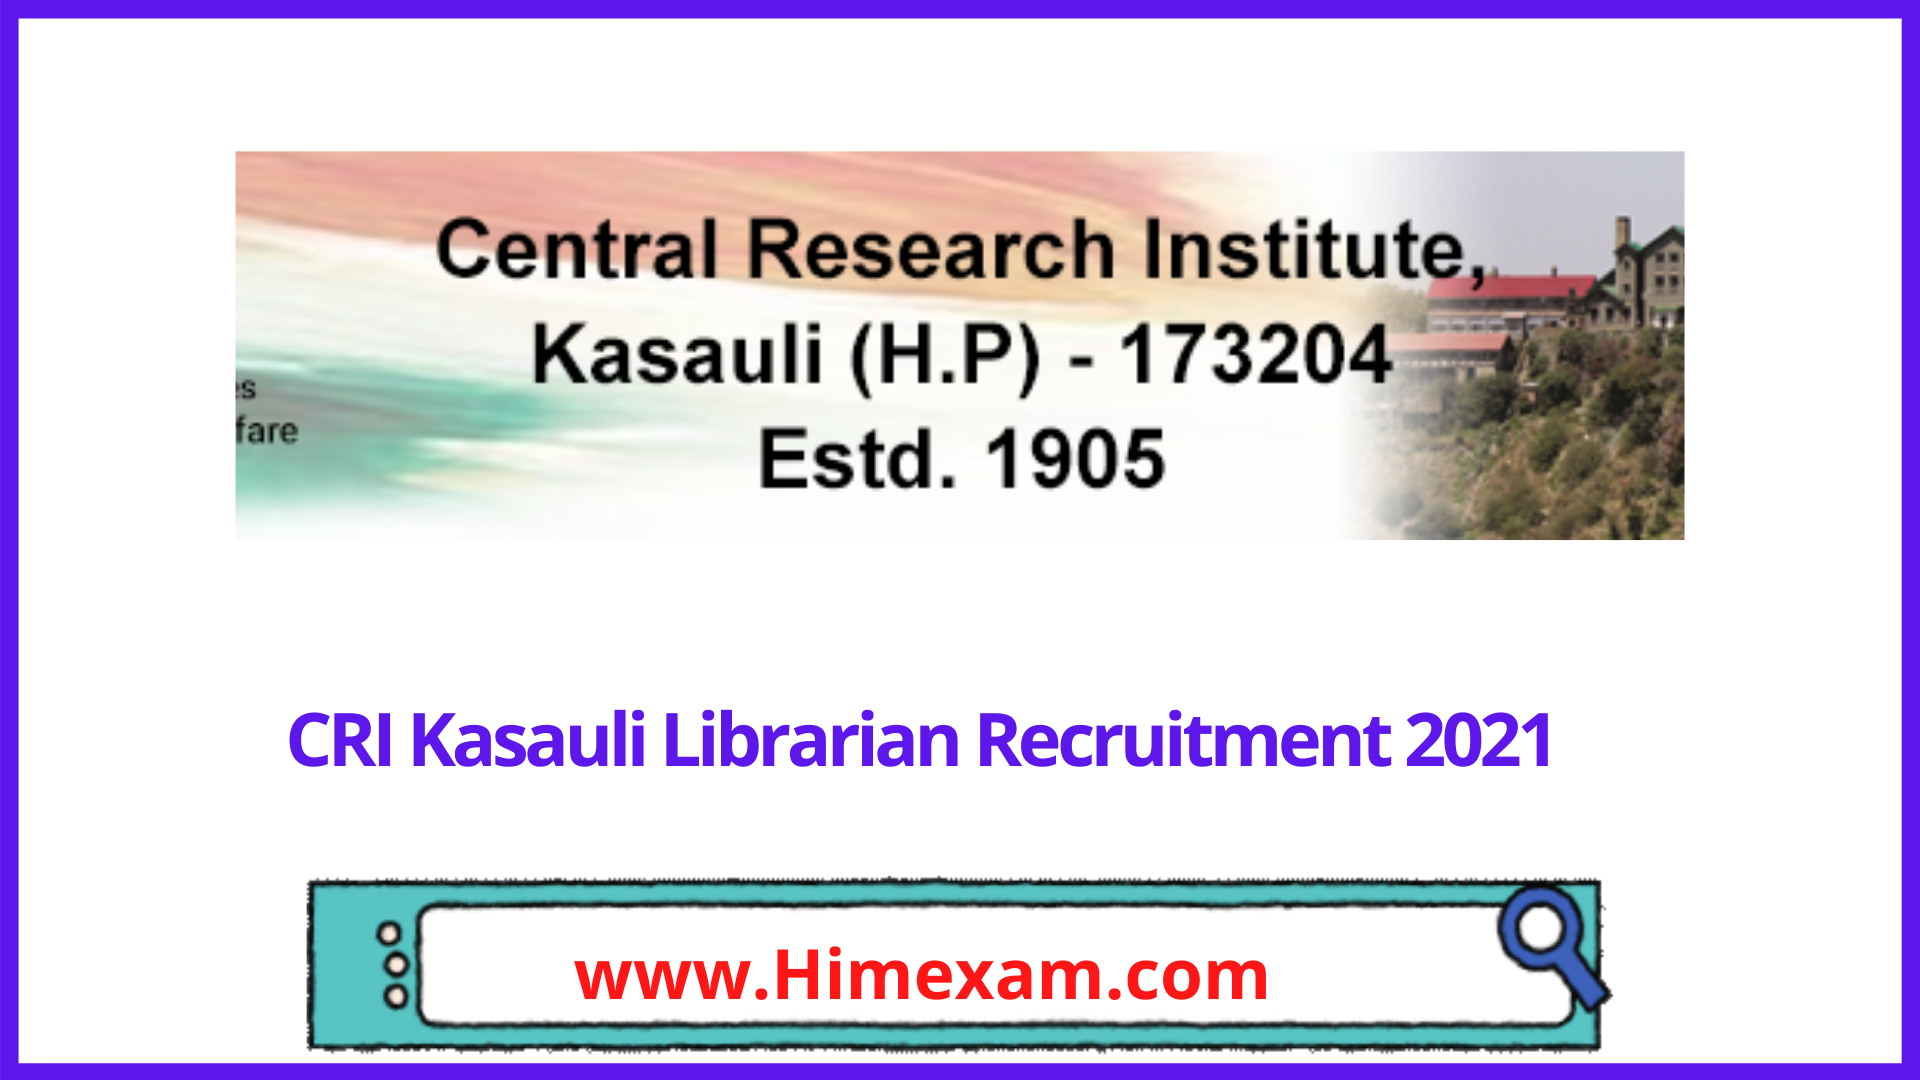 CRI Kasauli Librarian Recruitment 2021